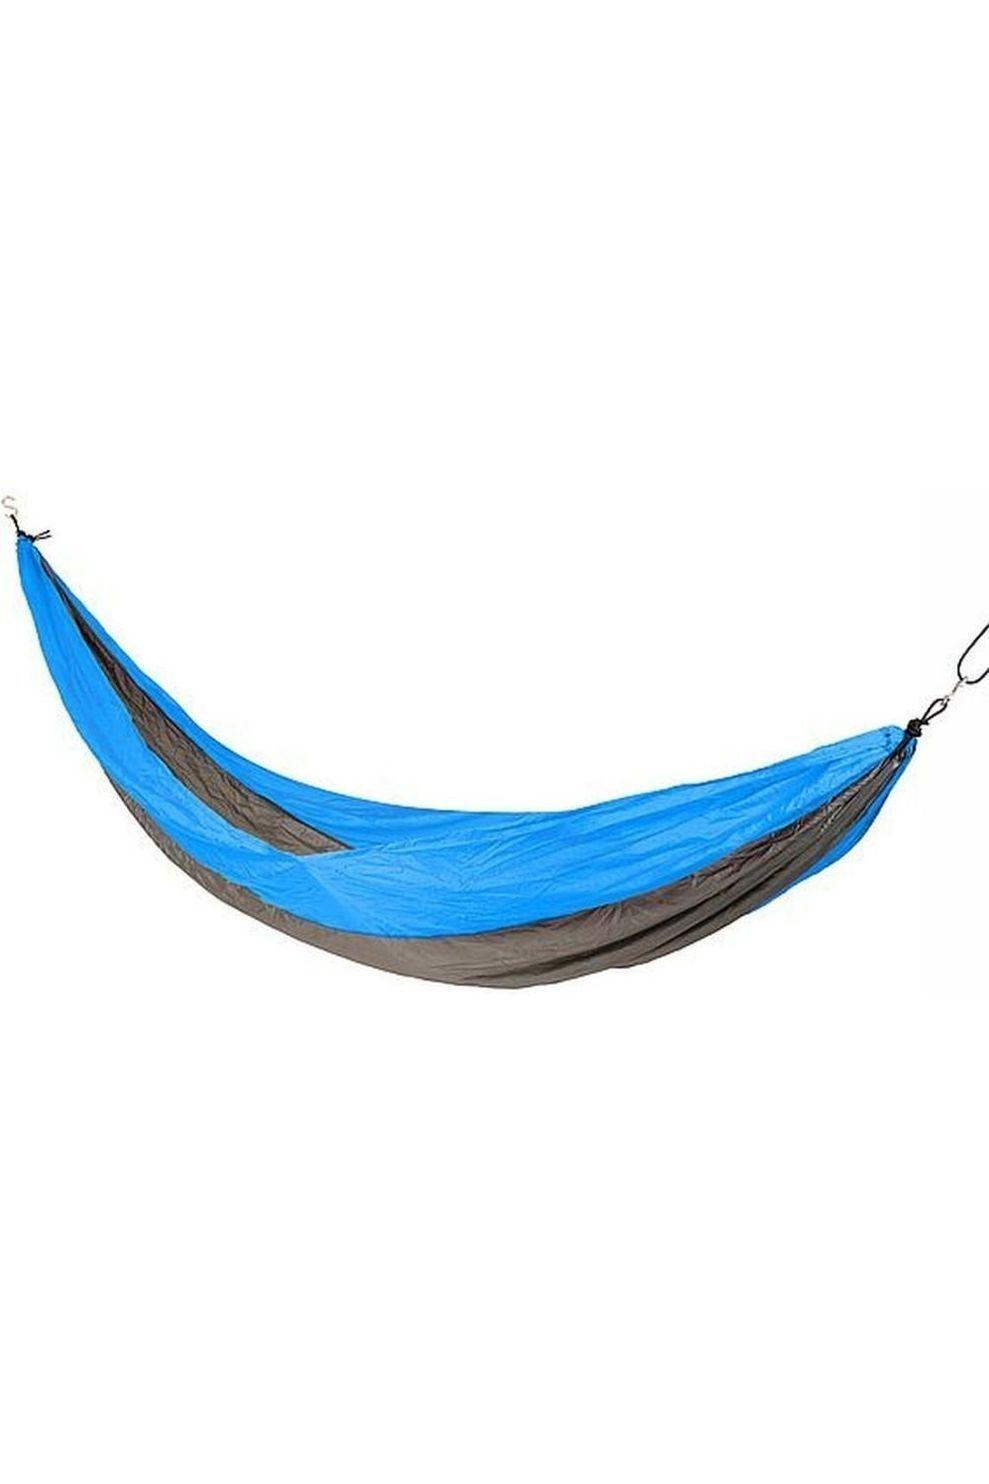 Bo-Camp Hangmat Parachute Hover - Blauw/Grijs